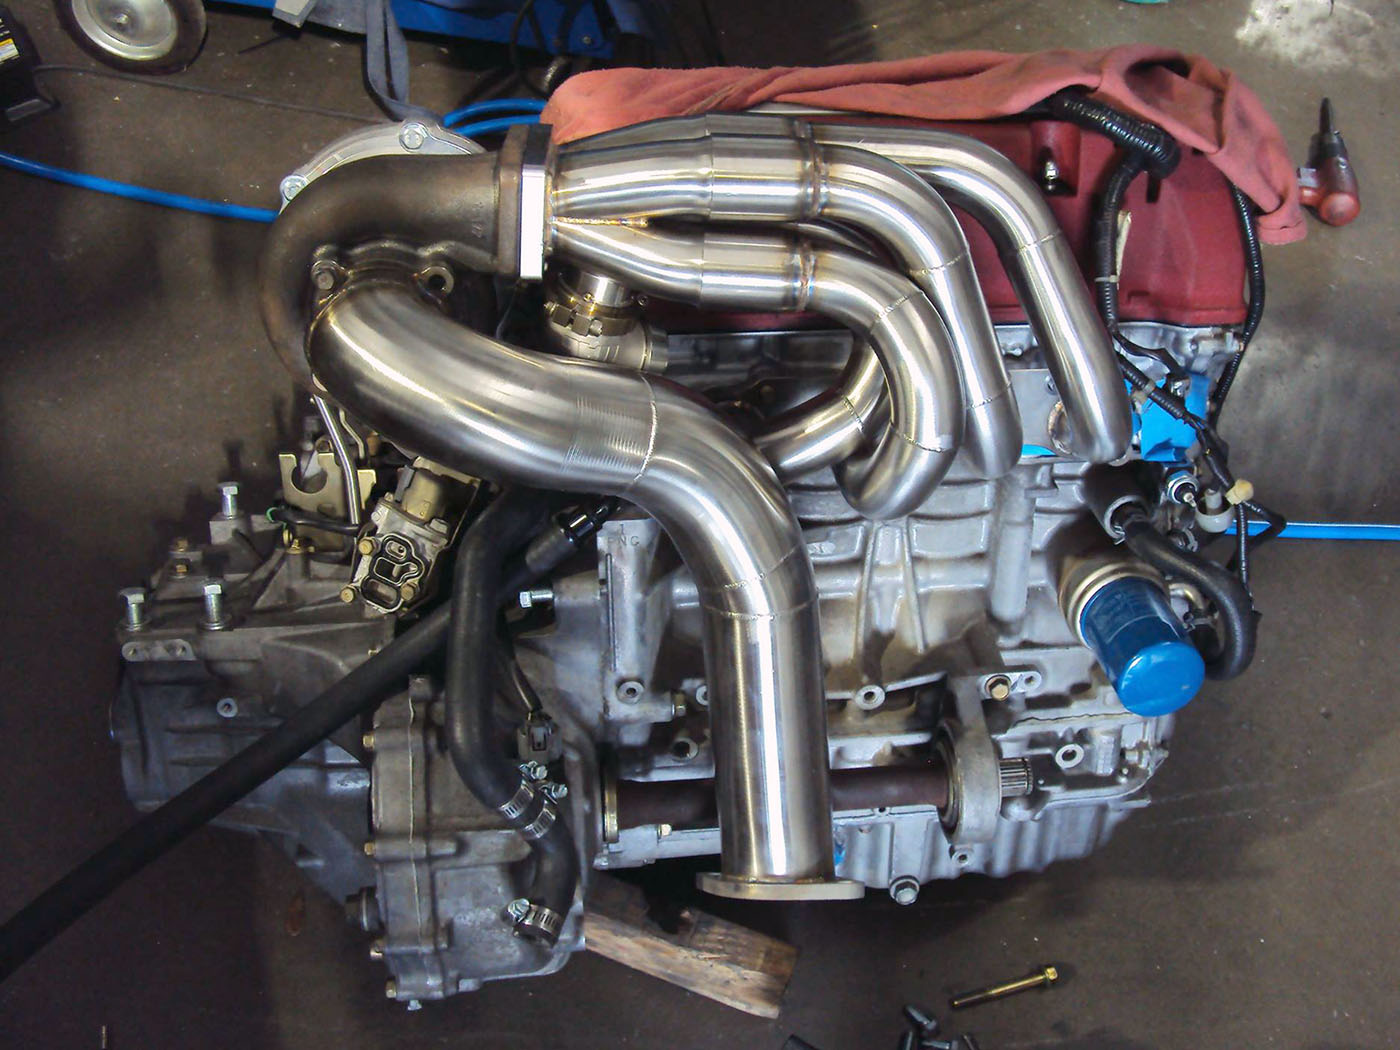 Subaru Legacy Alternator Diagram Awd Honda Insight With A Turbo K20 Engine Swap Depot